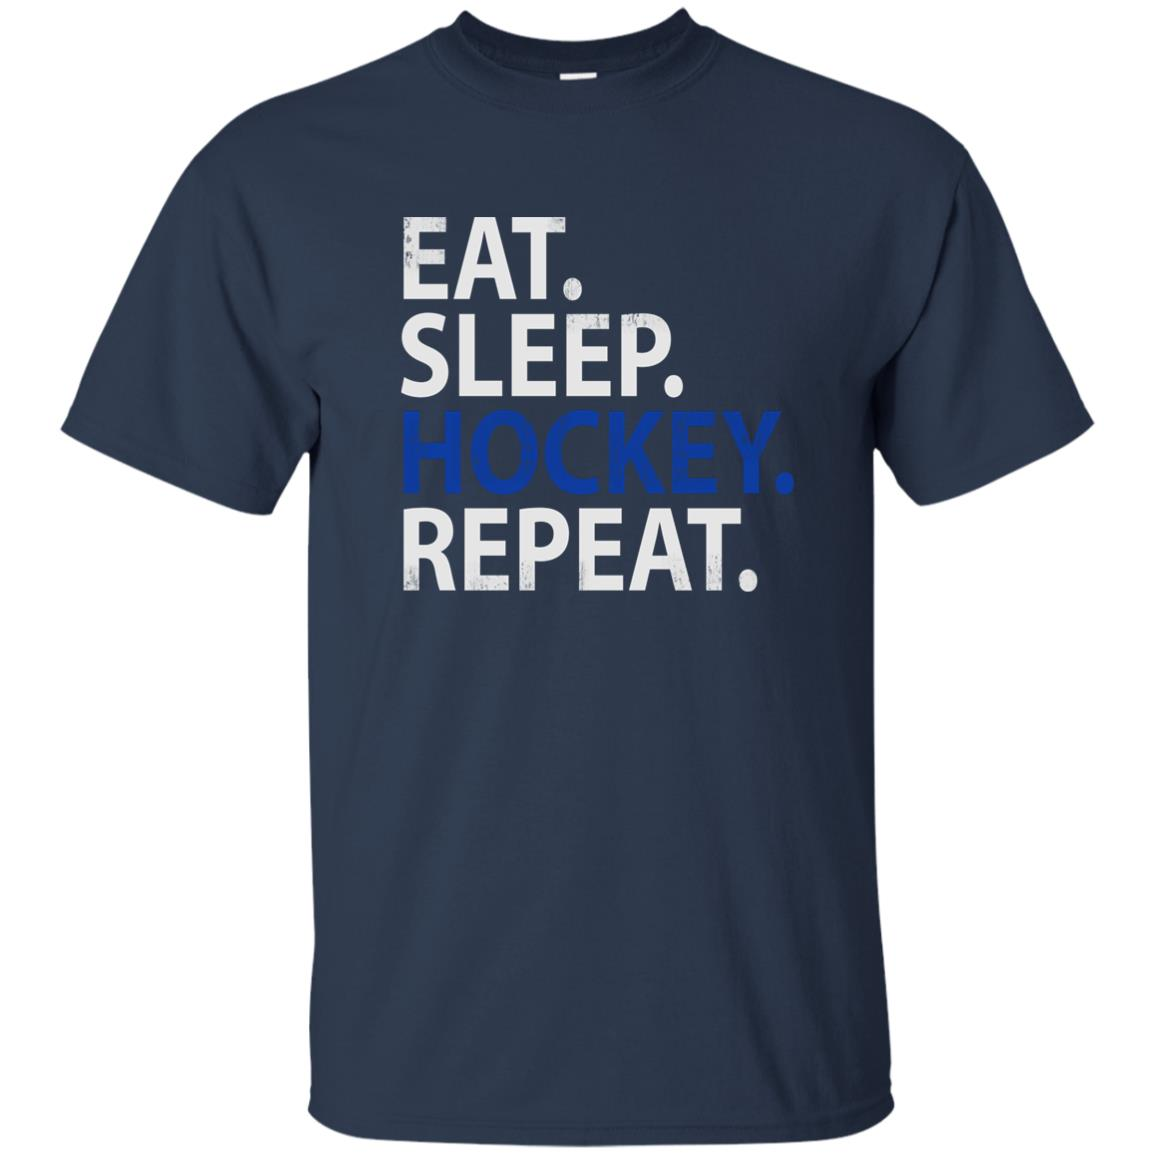 Eat Sleep Hockey Repeat Funny Birthday Party Unisex Short Sleeve